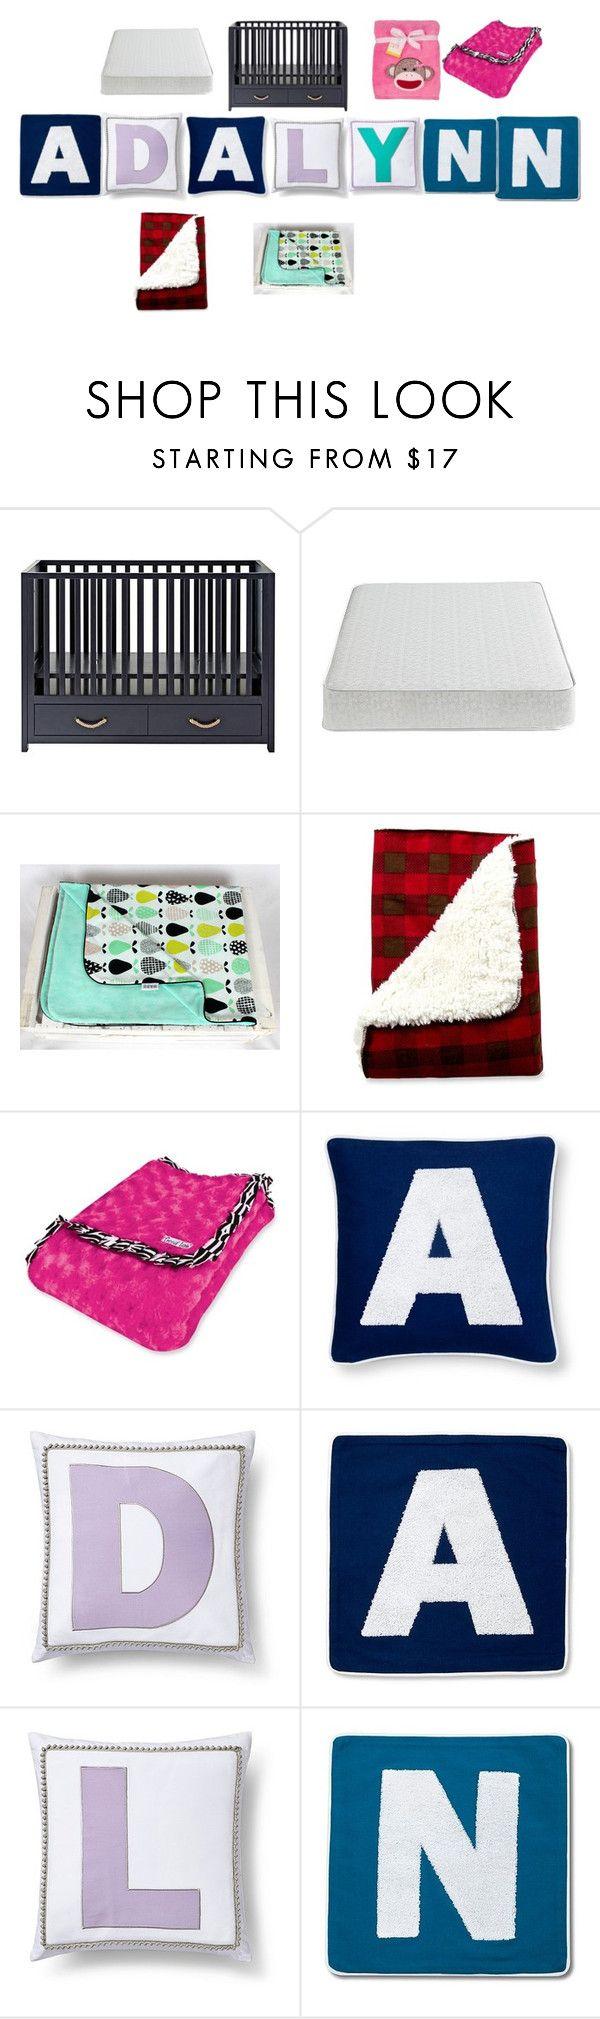 Adalynn's Bed Design, Trend lab, Clothes design